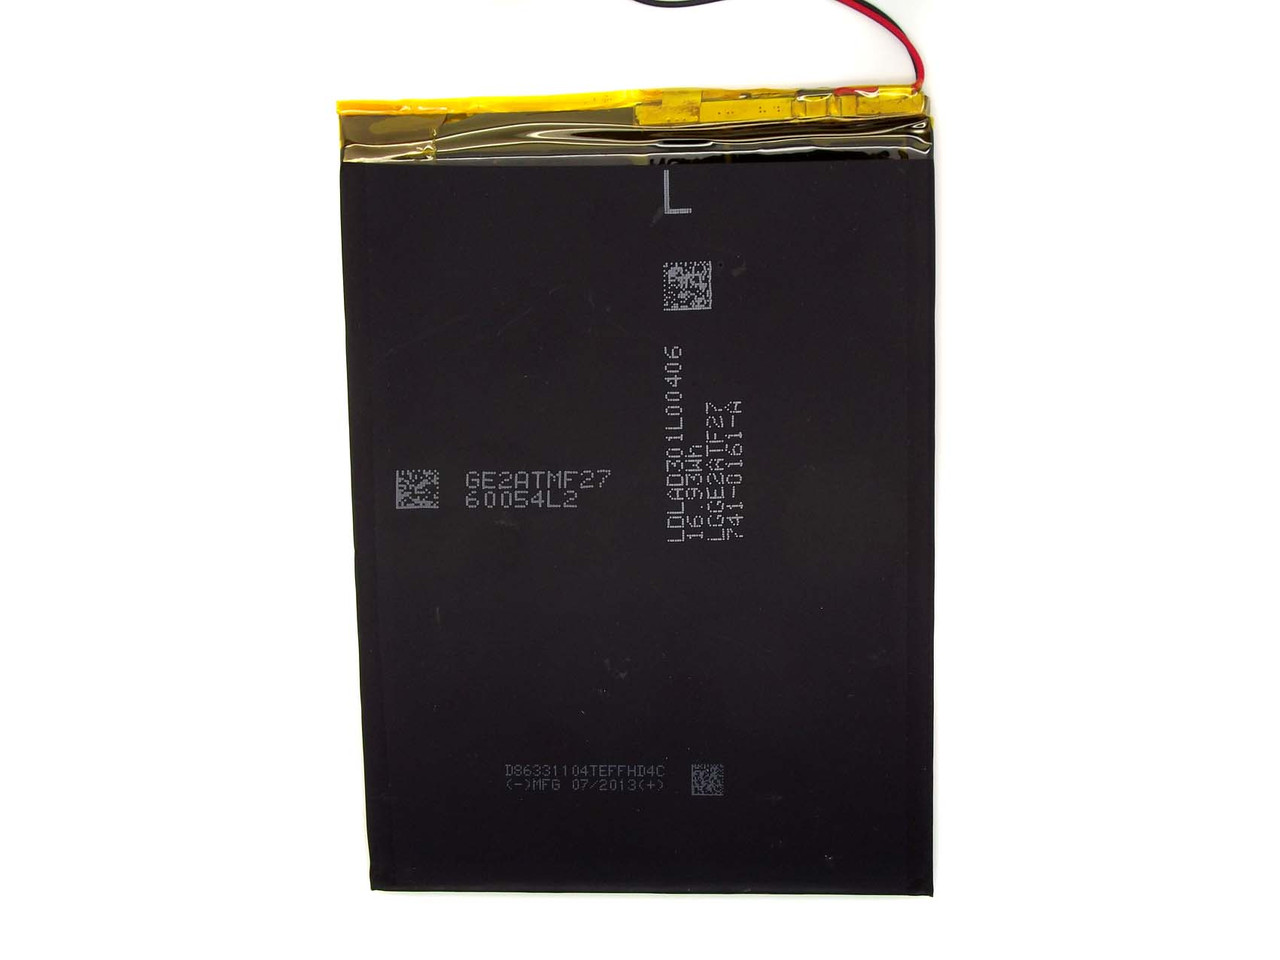 Аккумулятор 4600mAh 3.7v 2994130 17.09wh 9-ти дюймового планшета